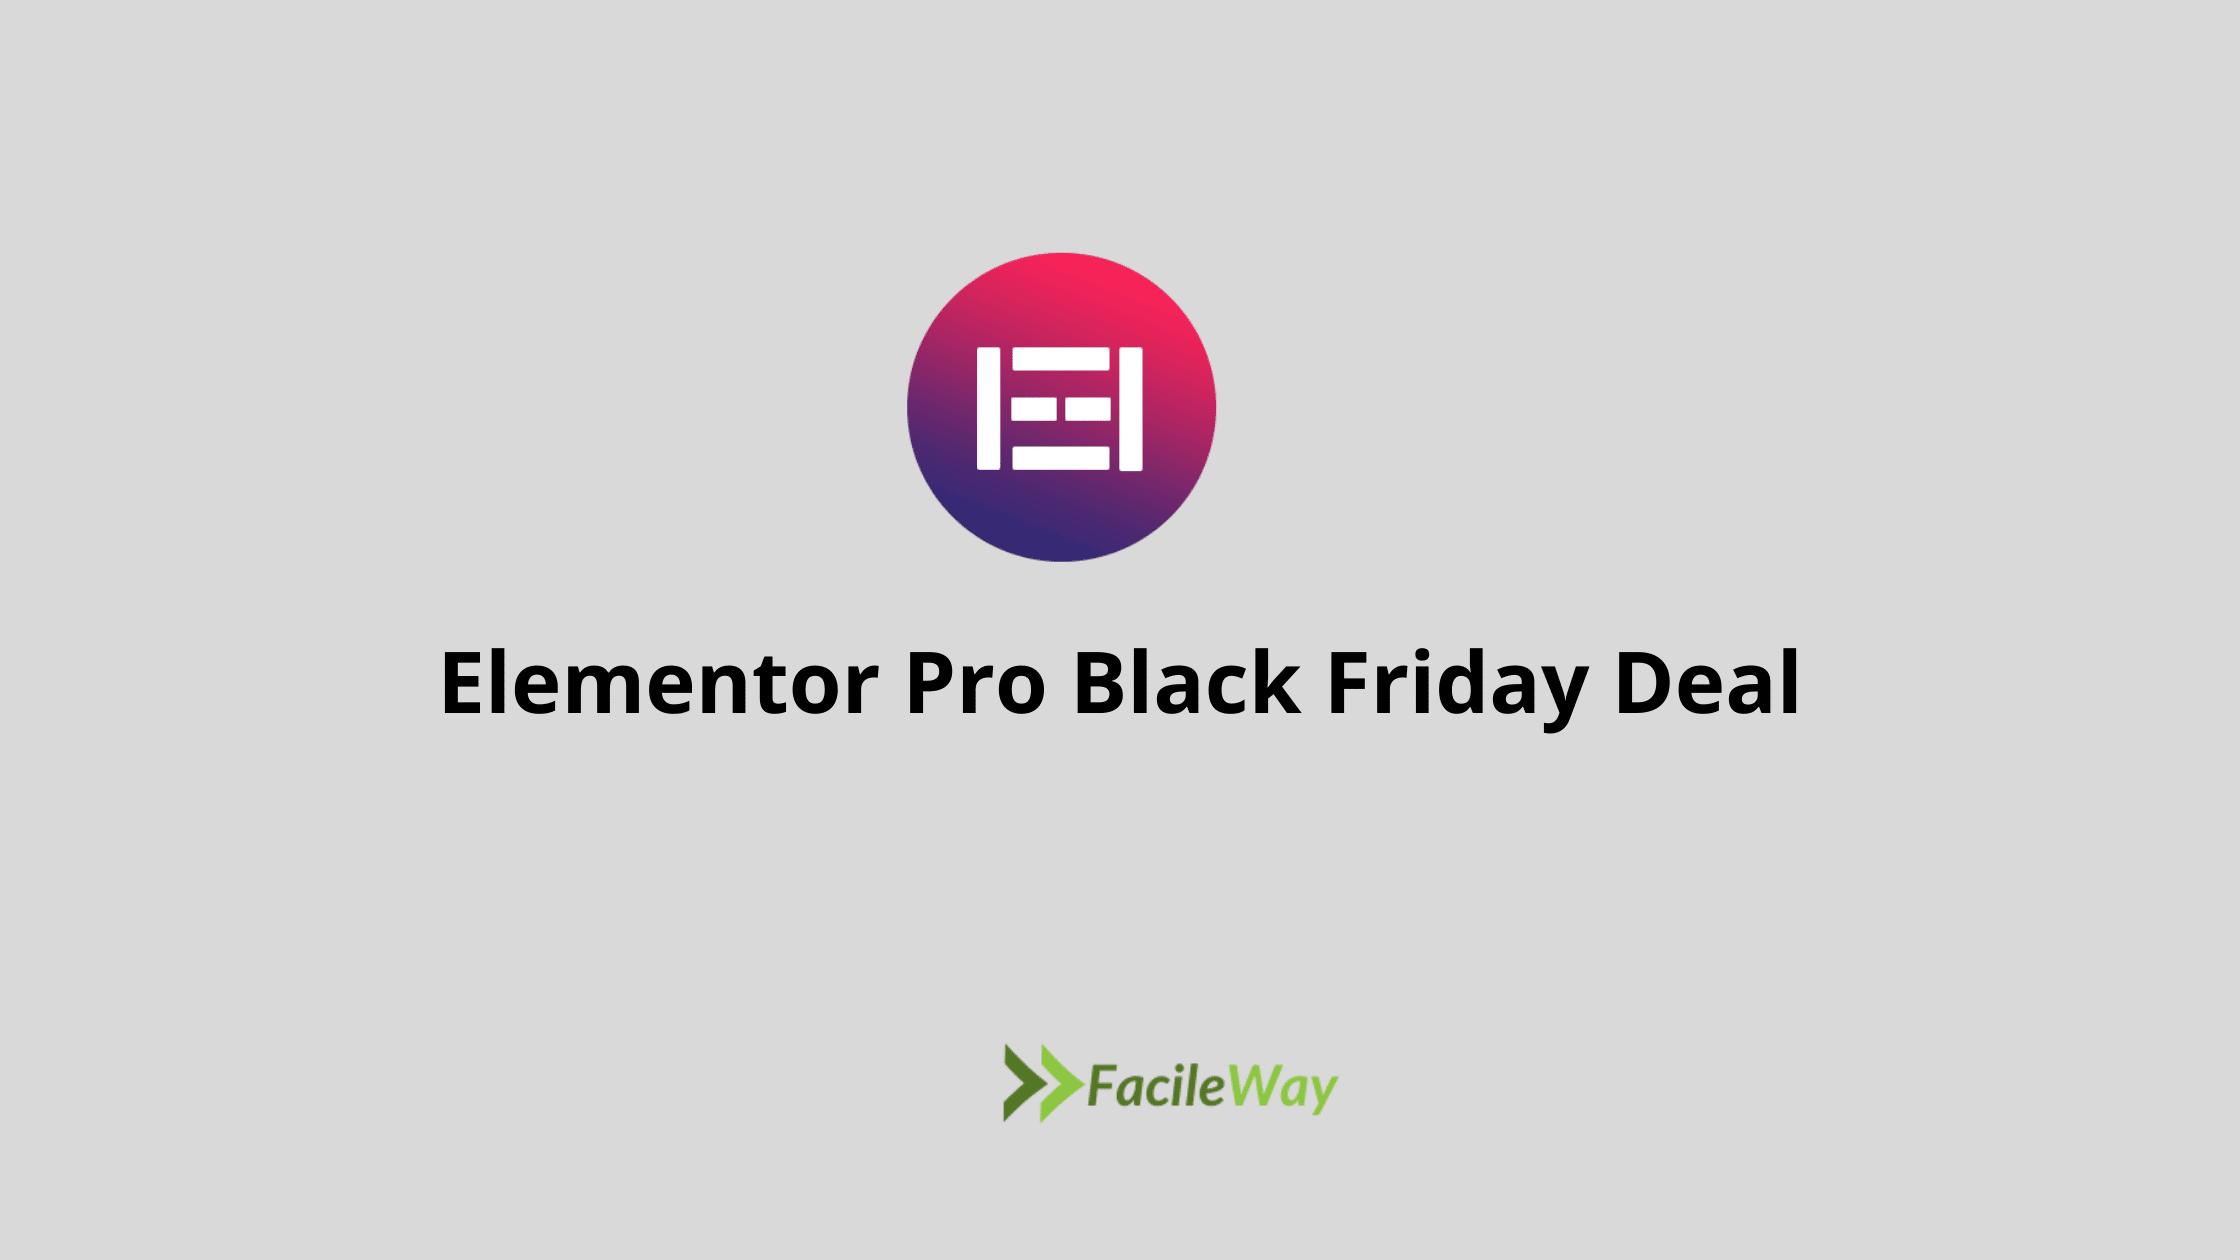 Elementor Pro black Friday Deal